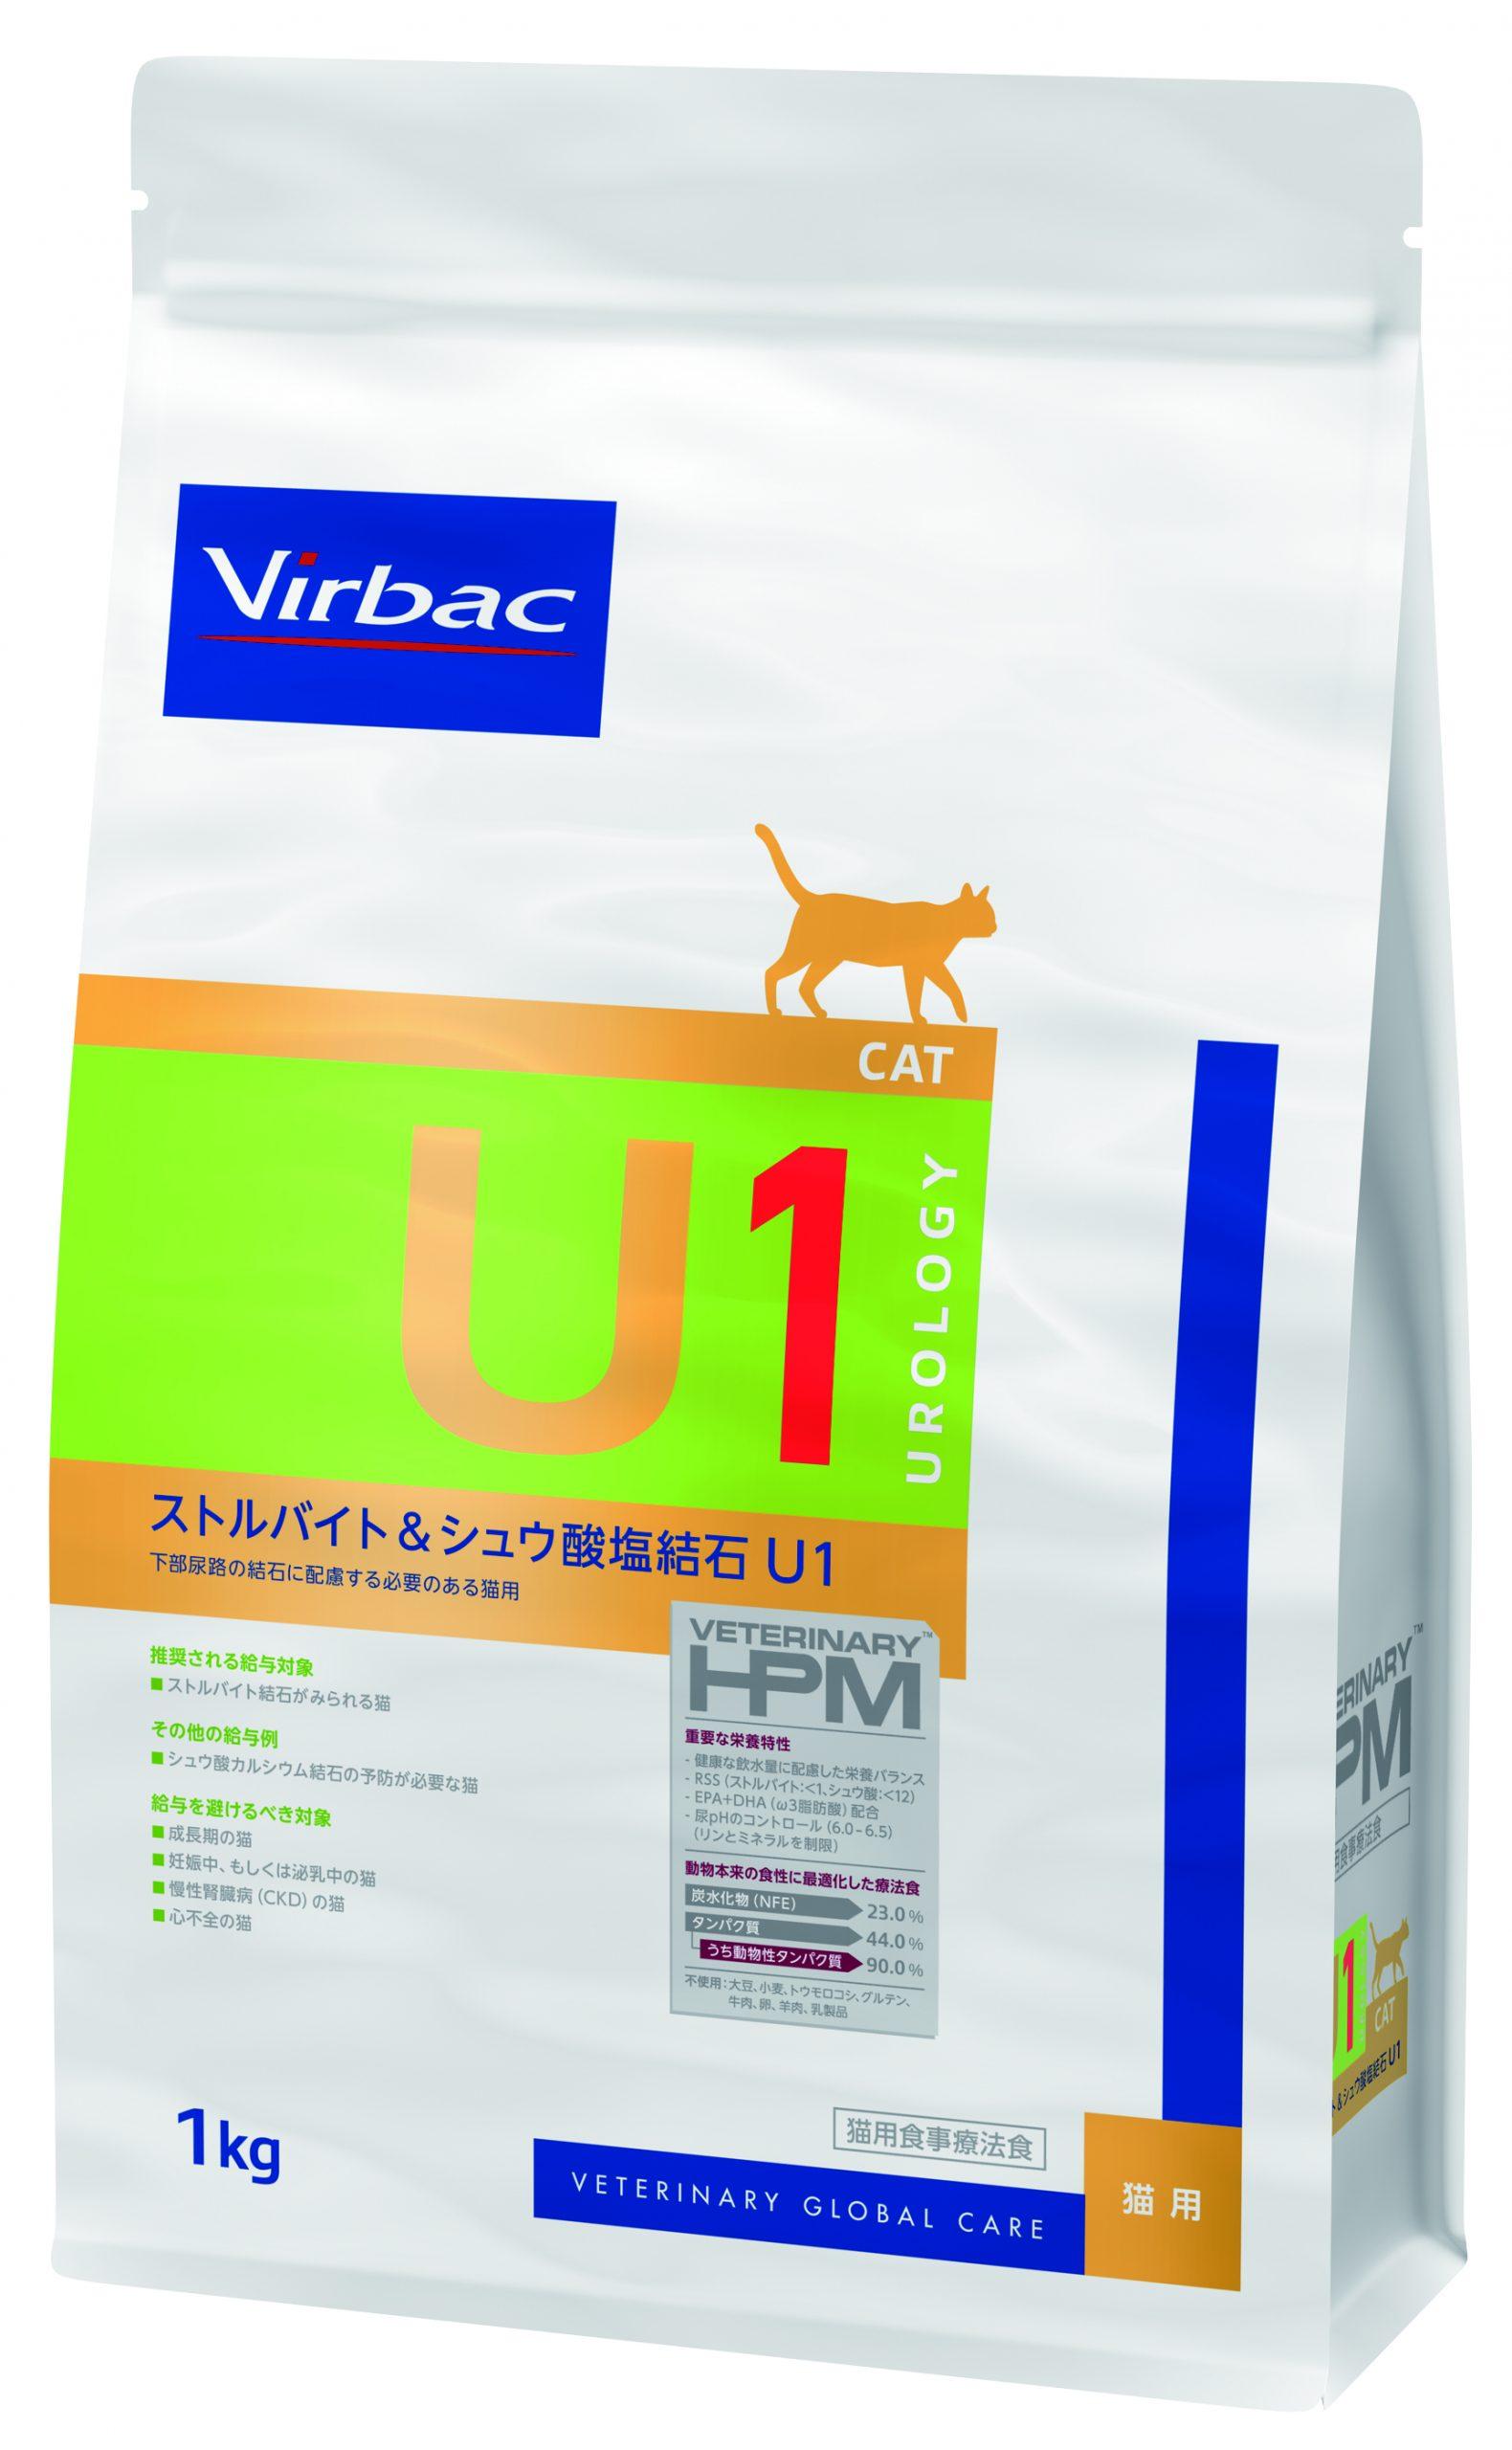 VETERINARY HPM 猫用 ストルバイト&シュウ酸塩結石 U1 1kg